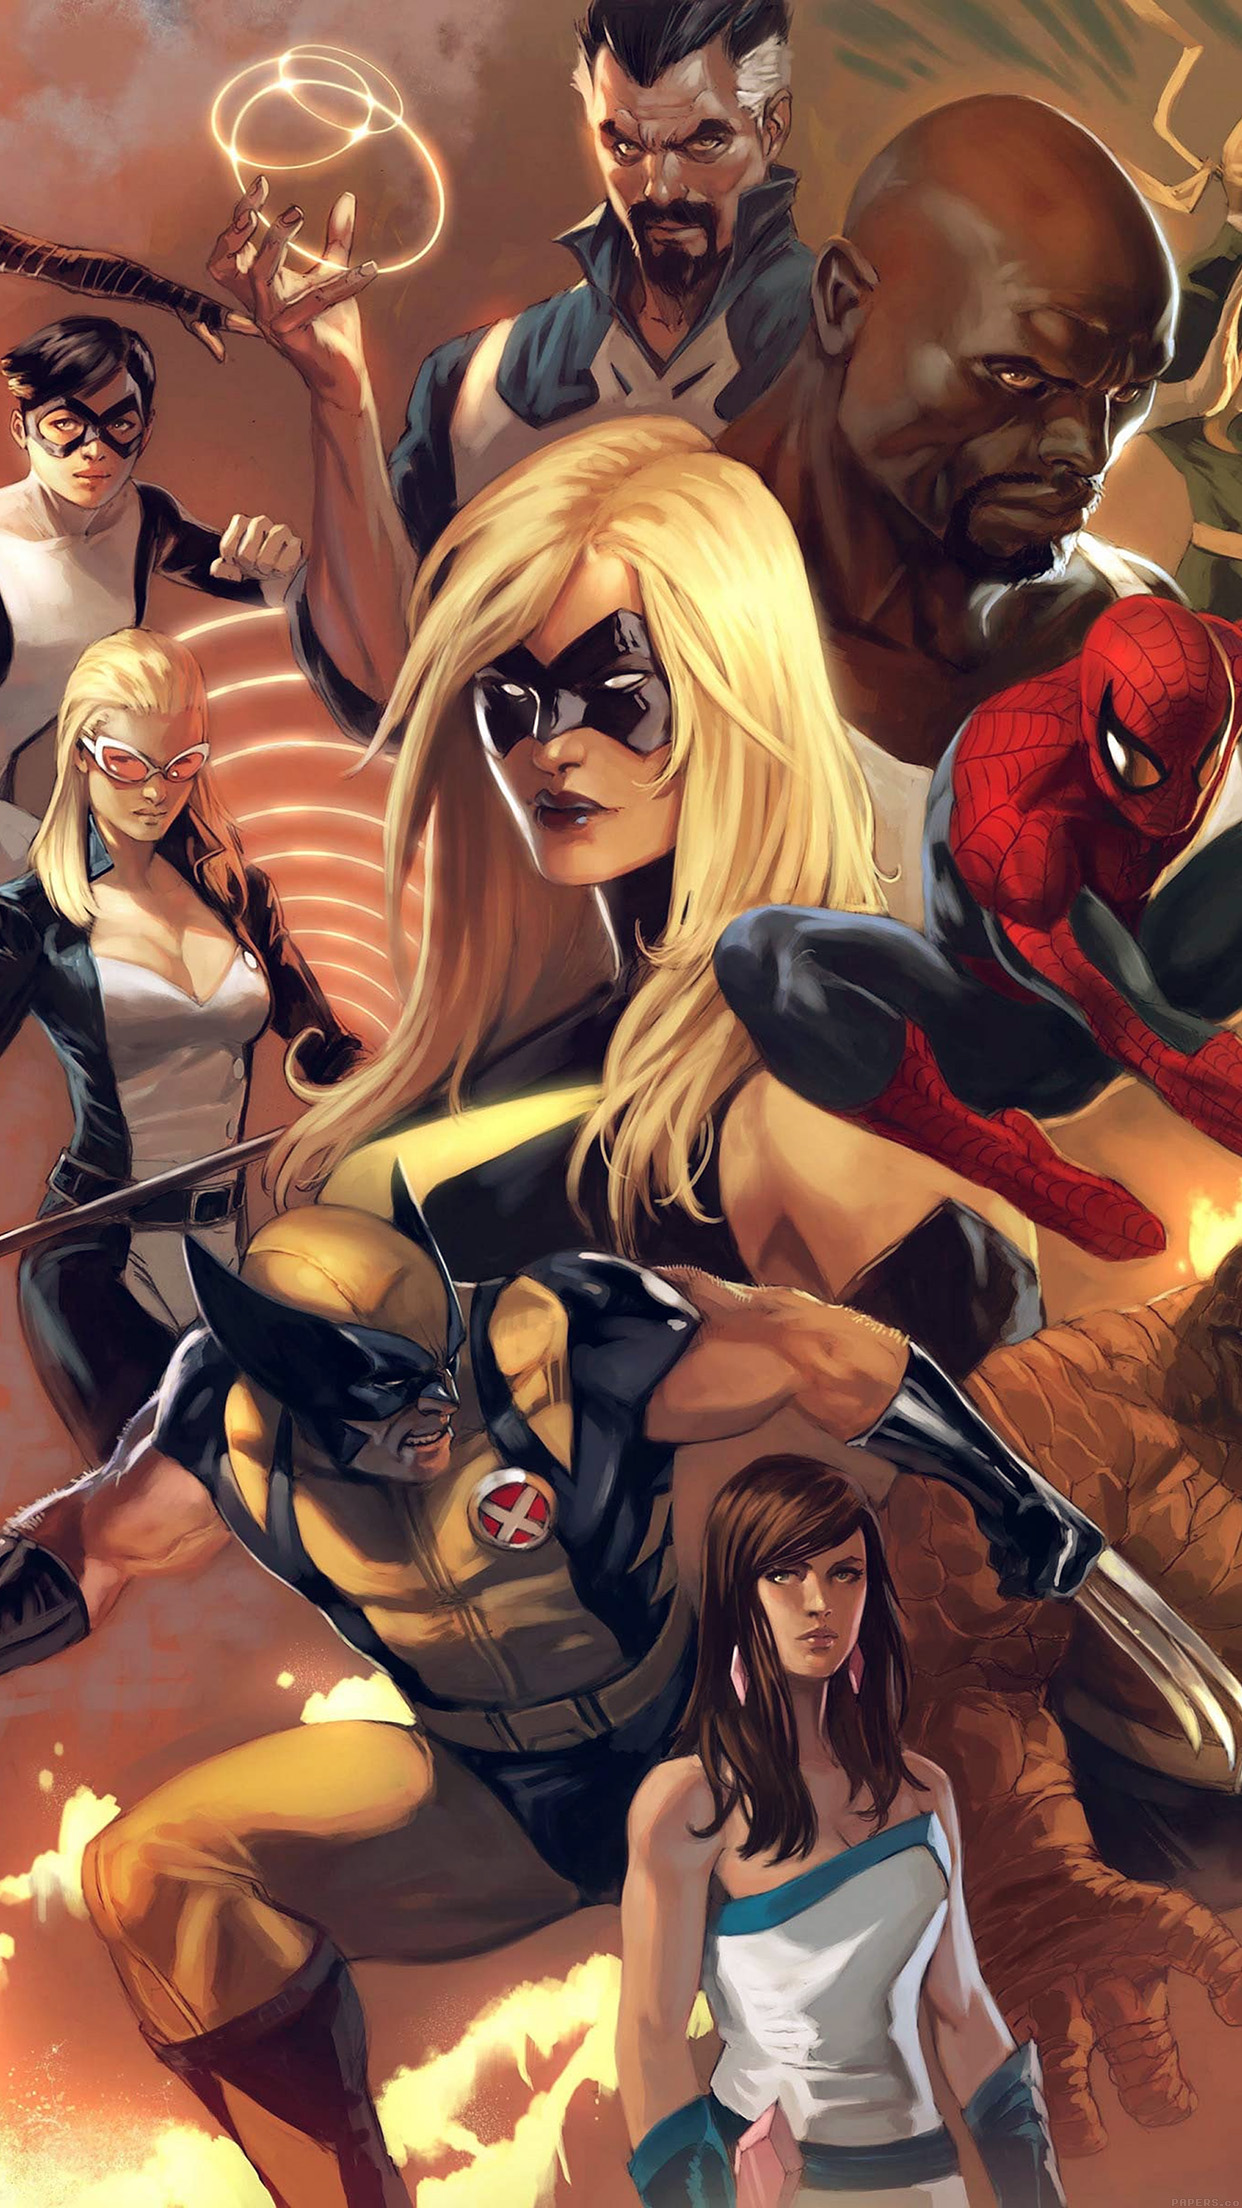 Iphone7papers Com Iphone7 Wallpaper Al80 Avengers Liiust Comics